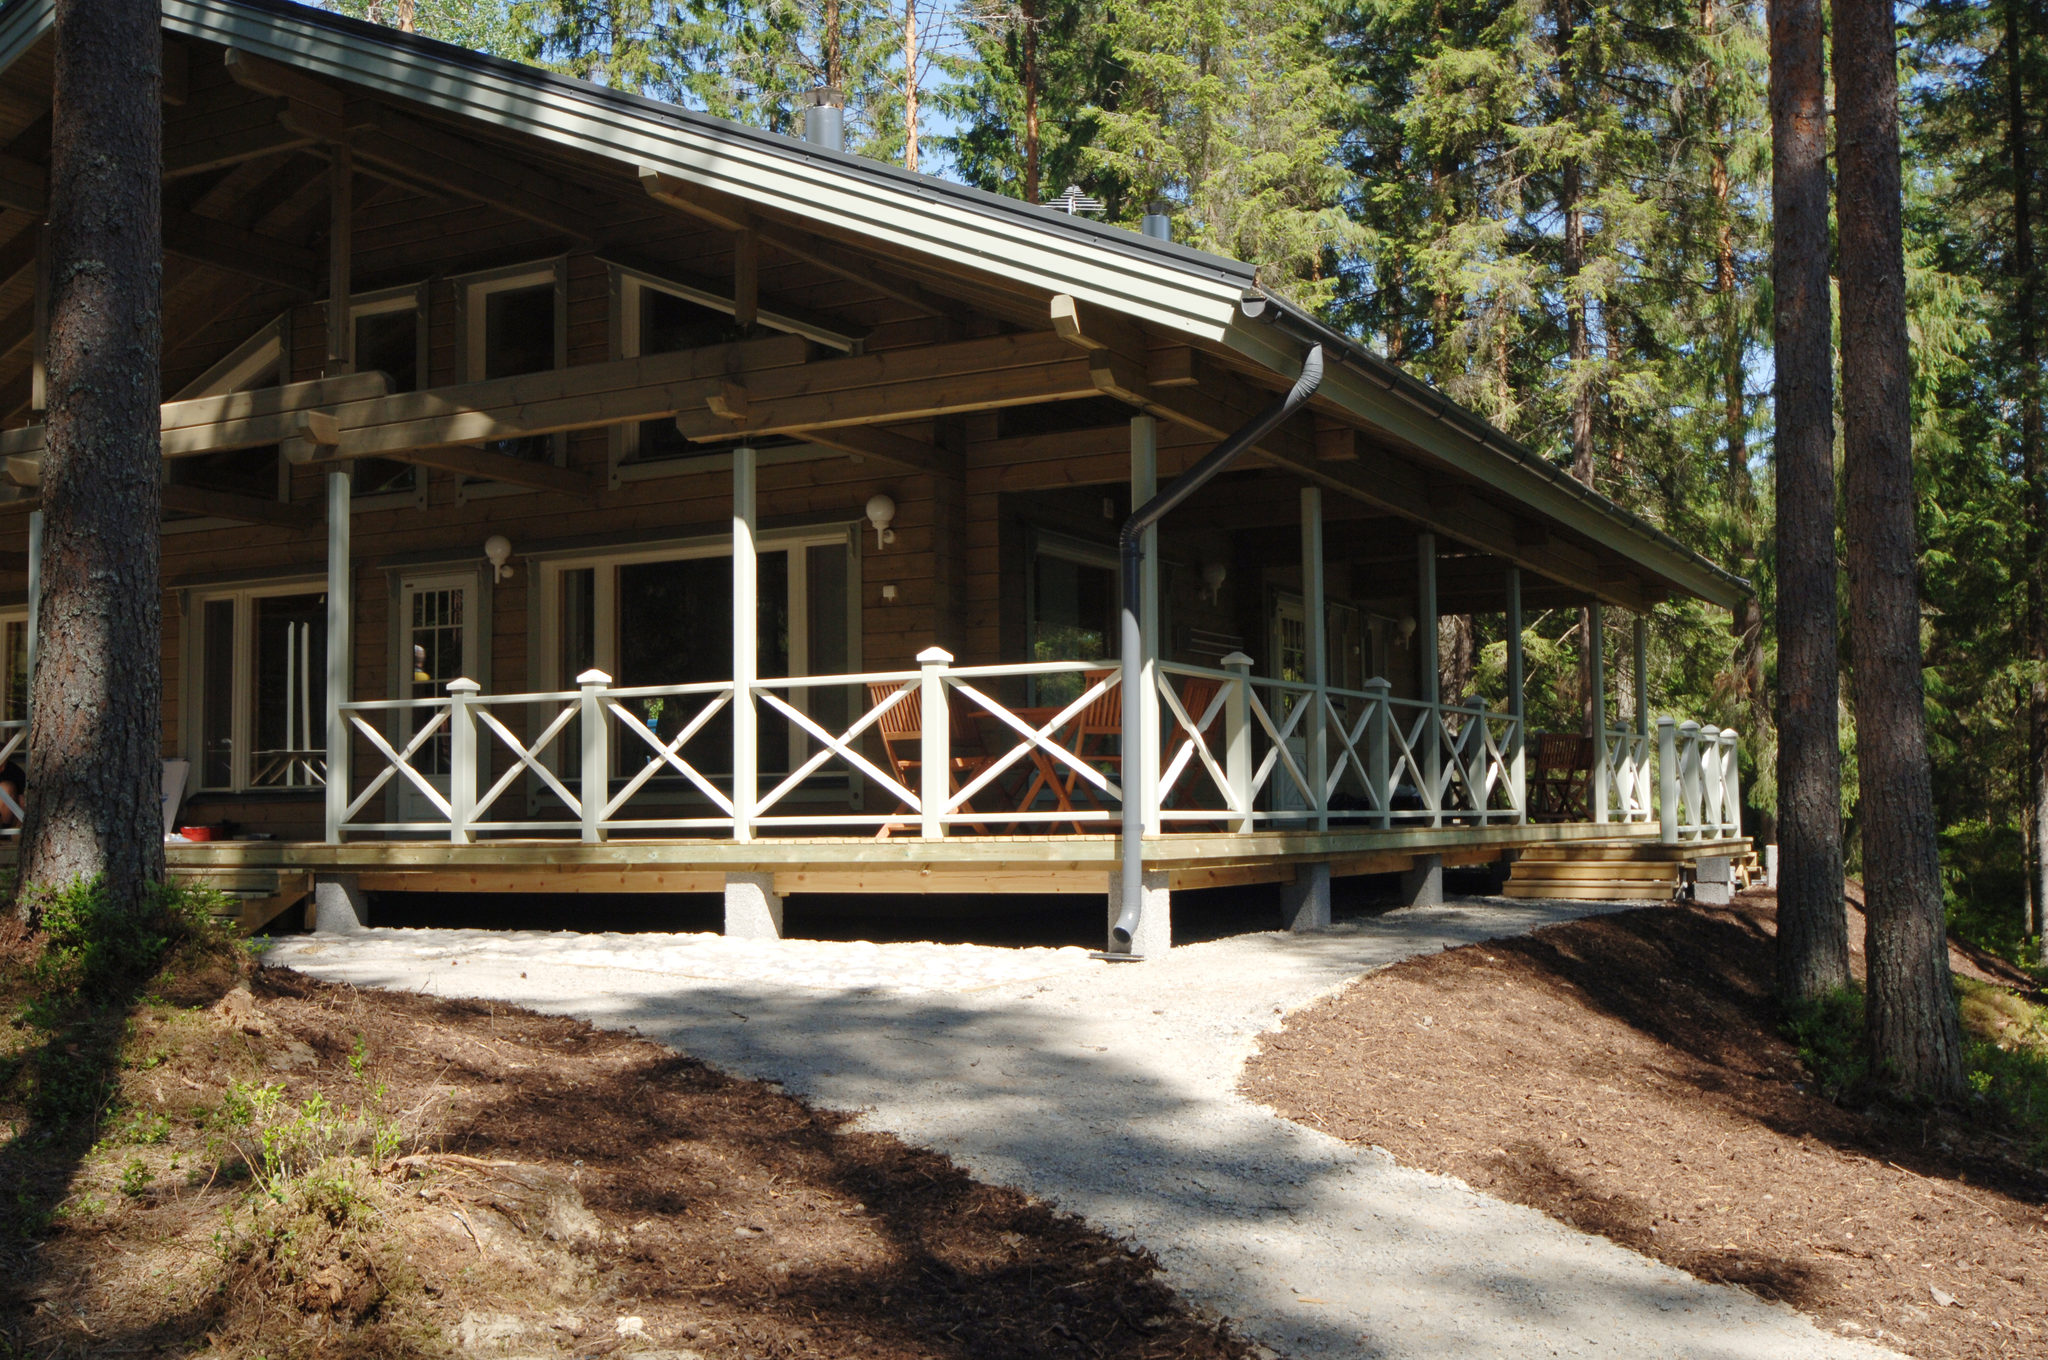 Villa Venla, 10 Personen, 3 Schlafzimmer, 150m², Mikkeli